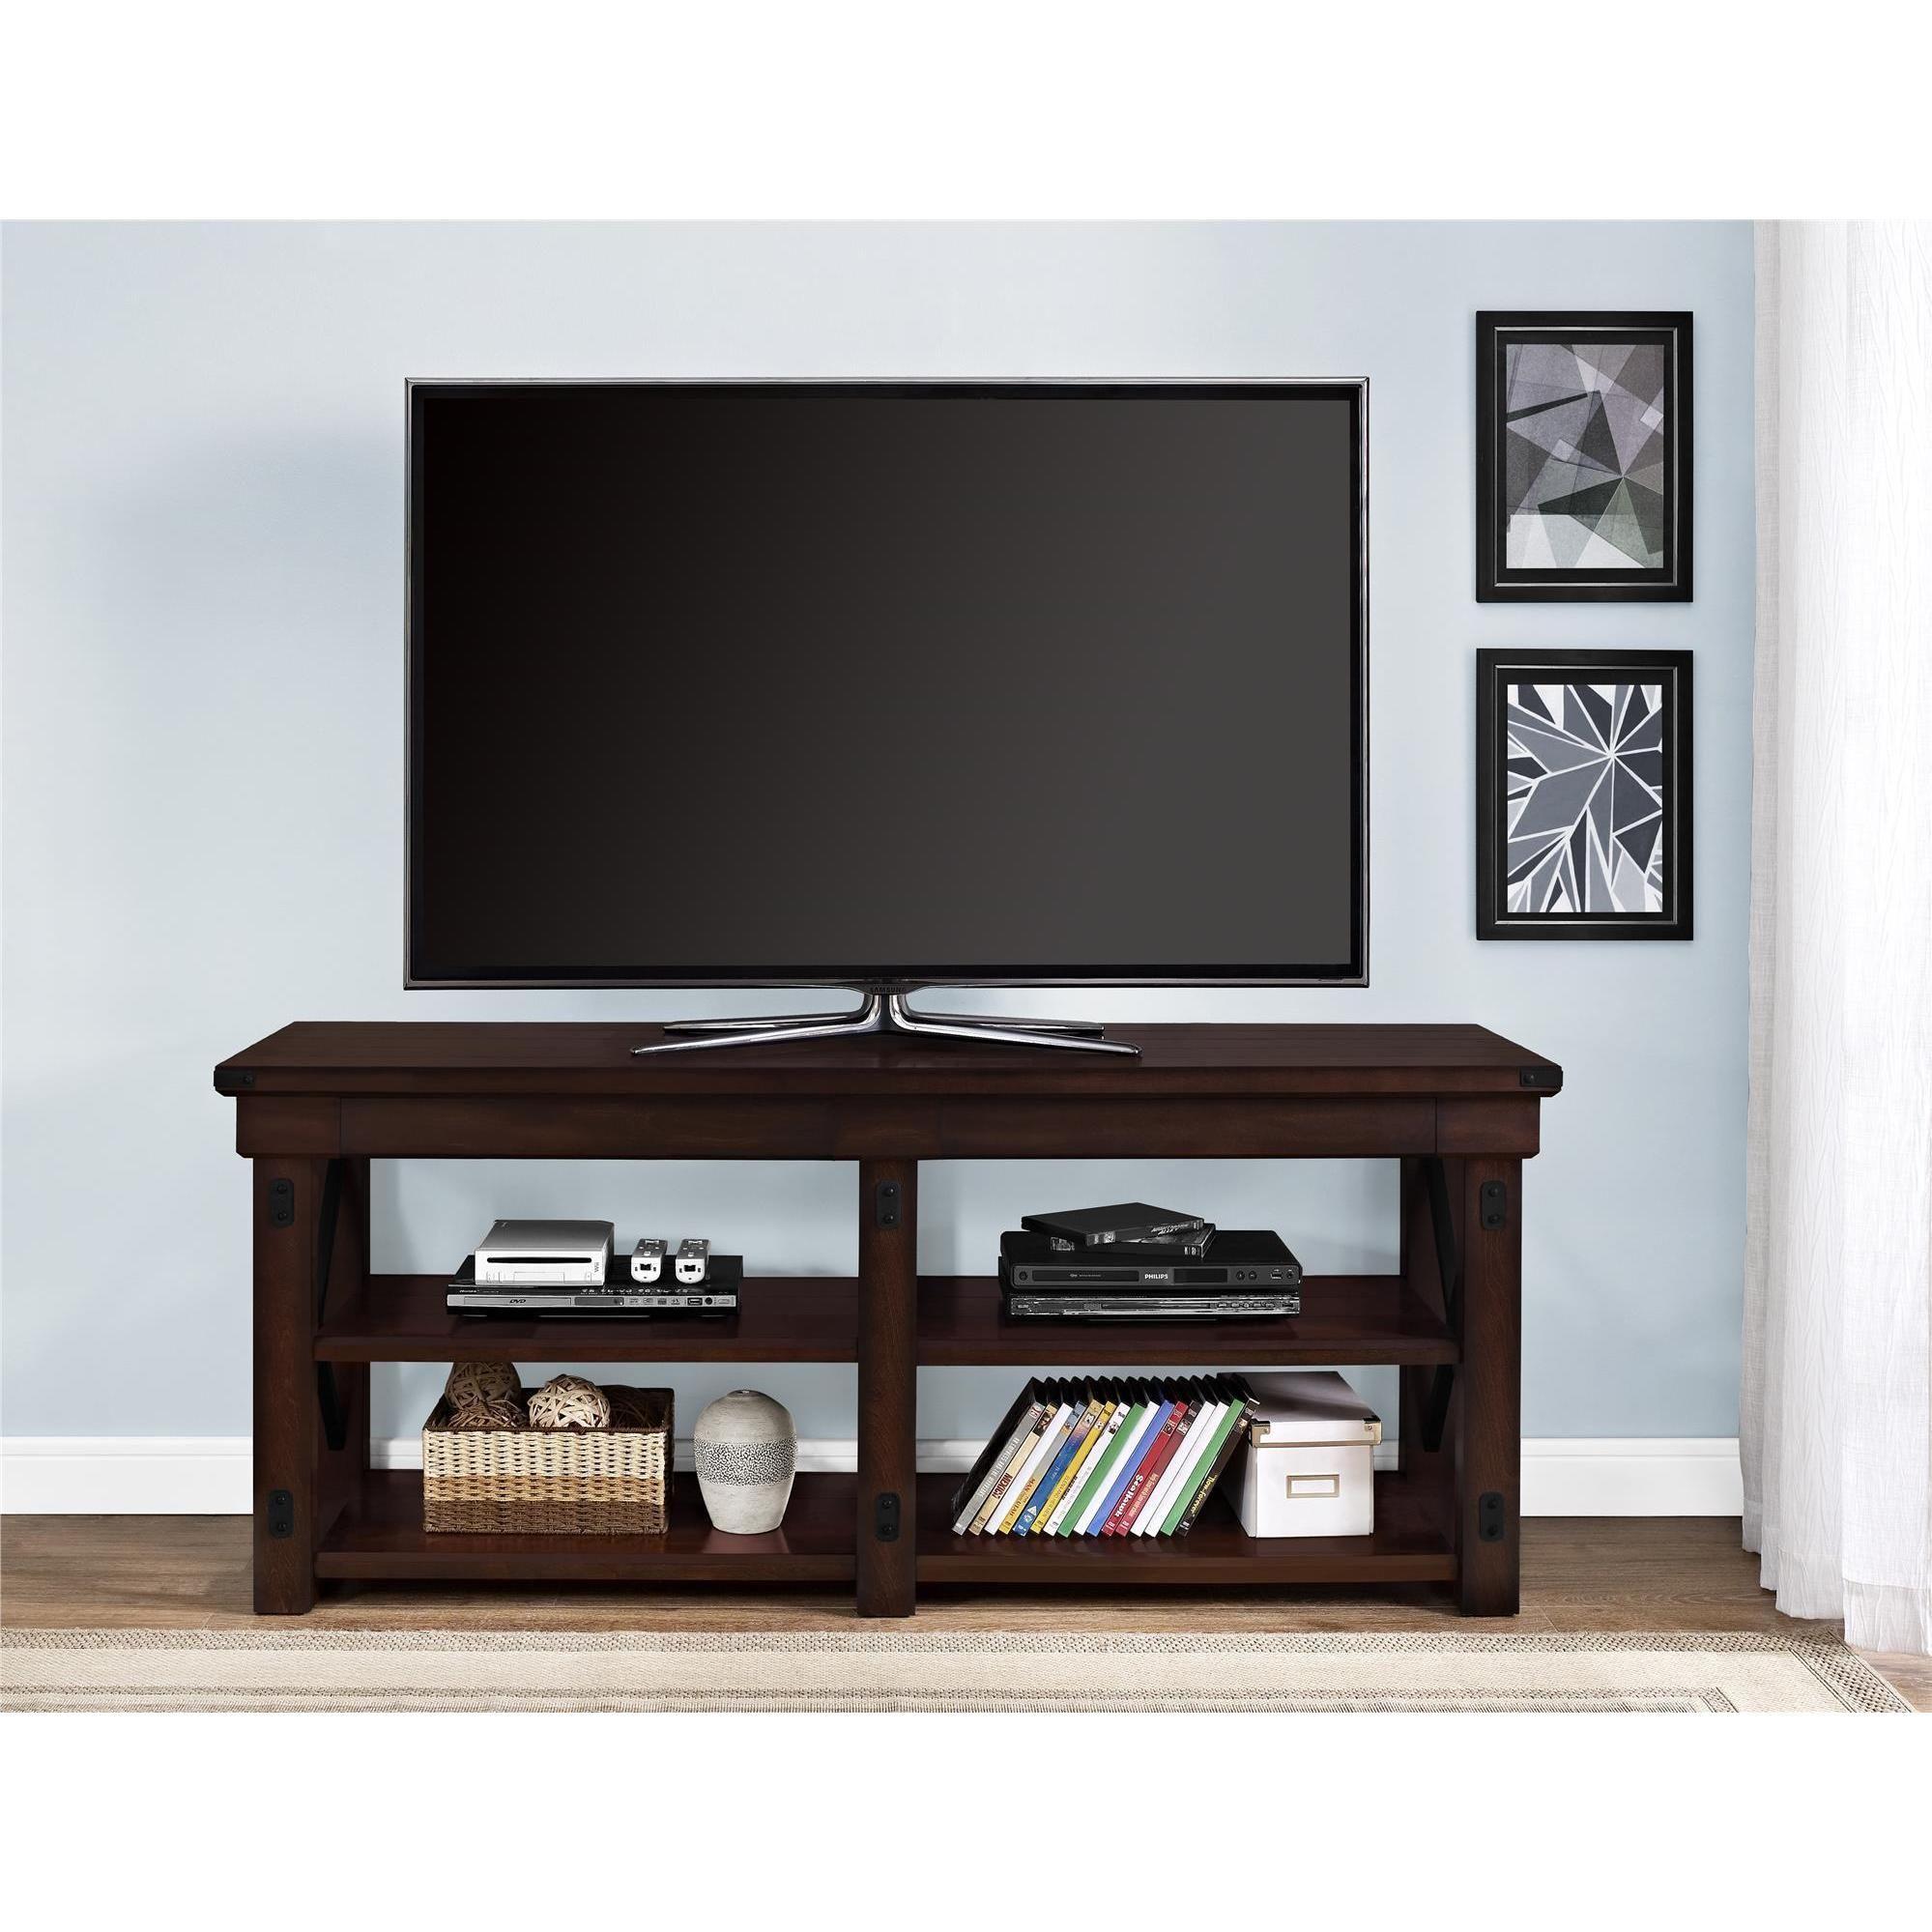 Altra Wildwood Mahogany Veneer 65 inch TV Stand 65 inch TV stand